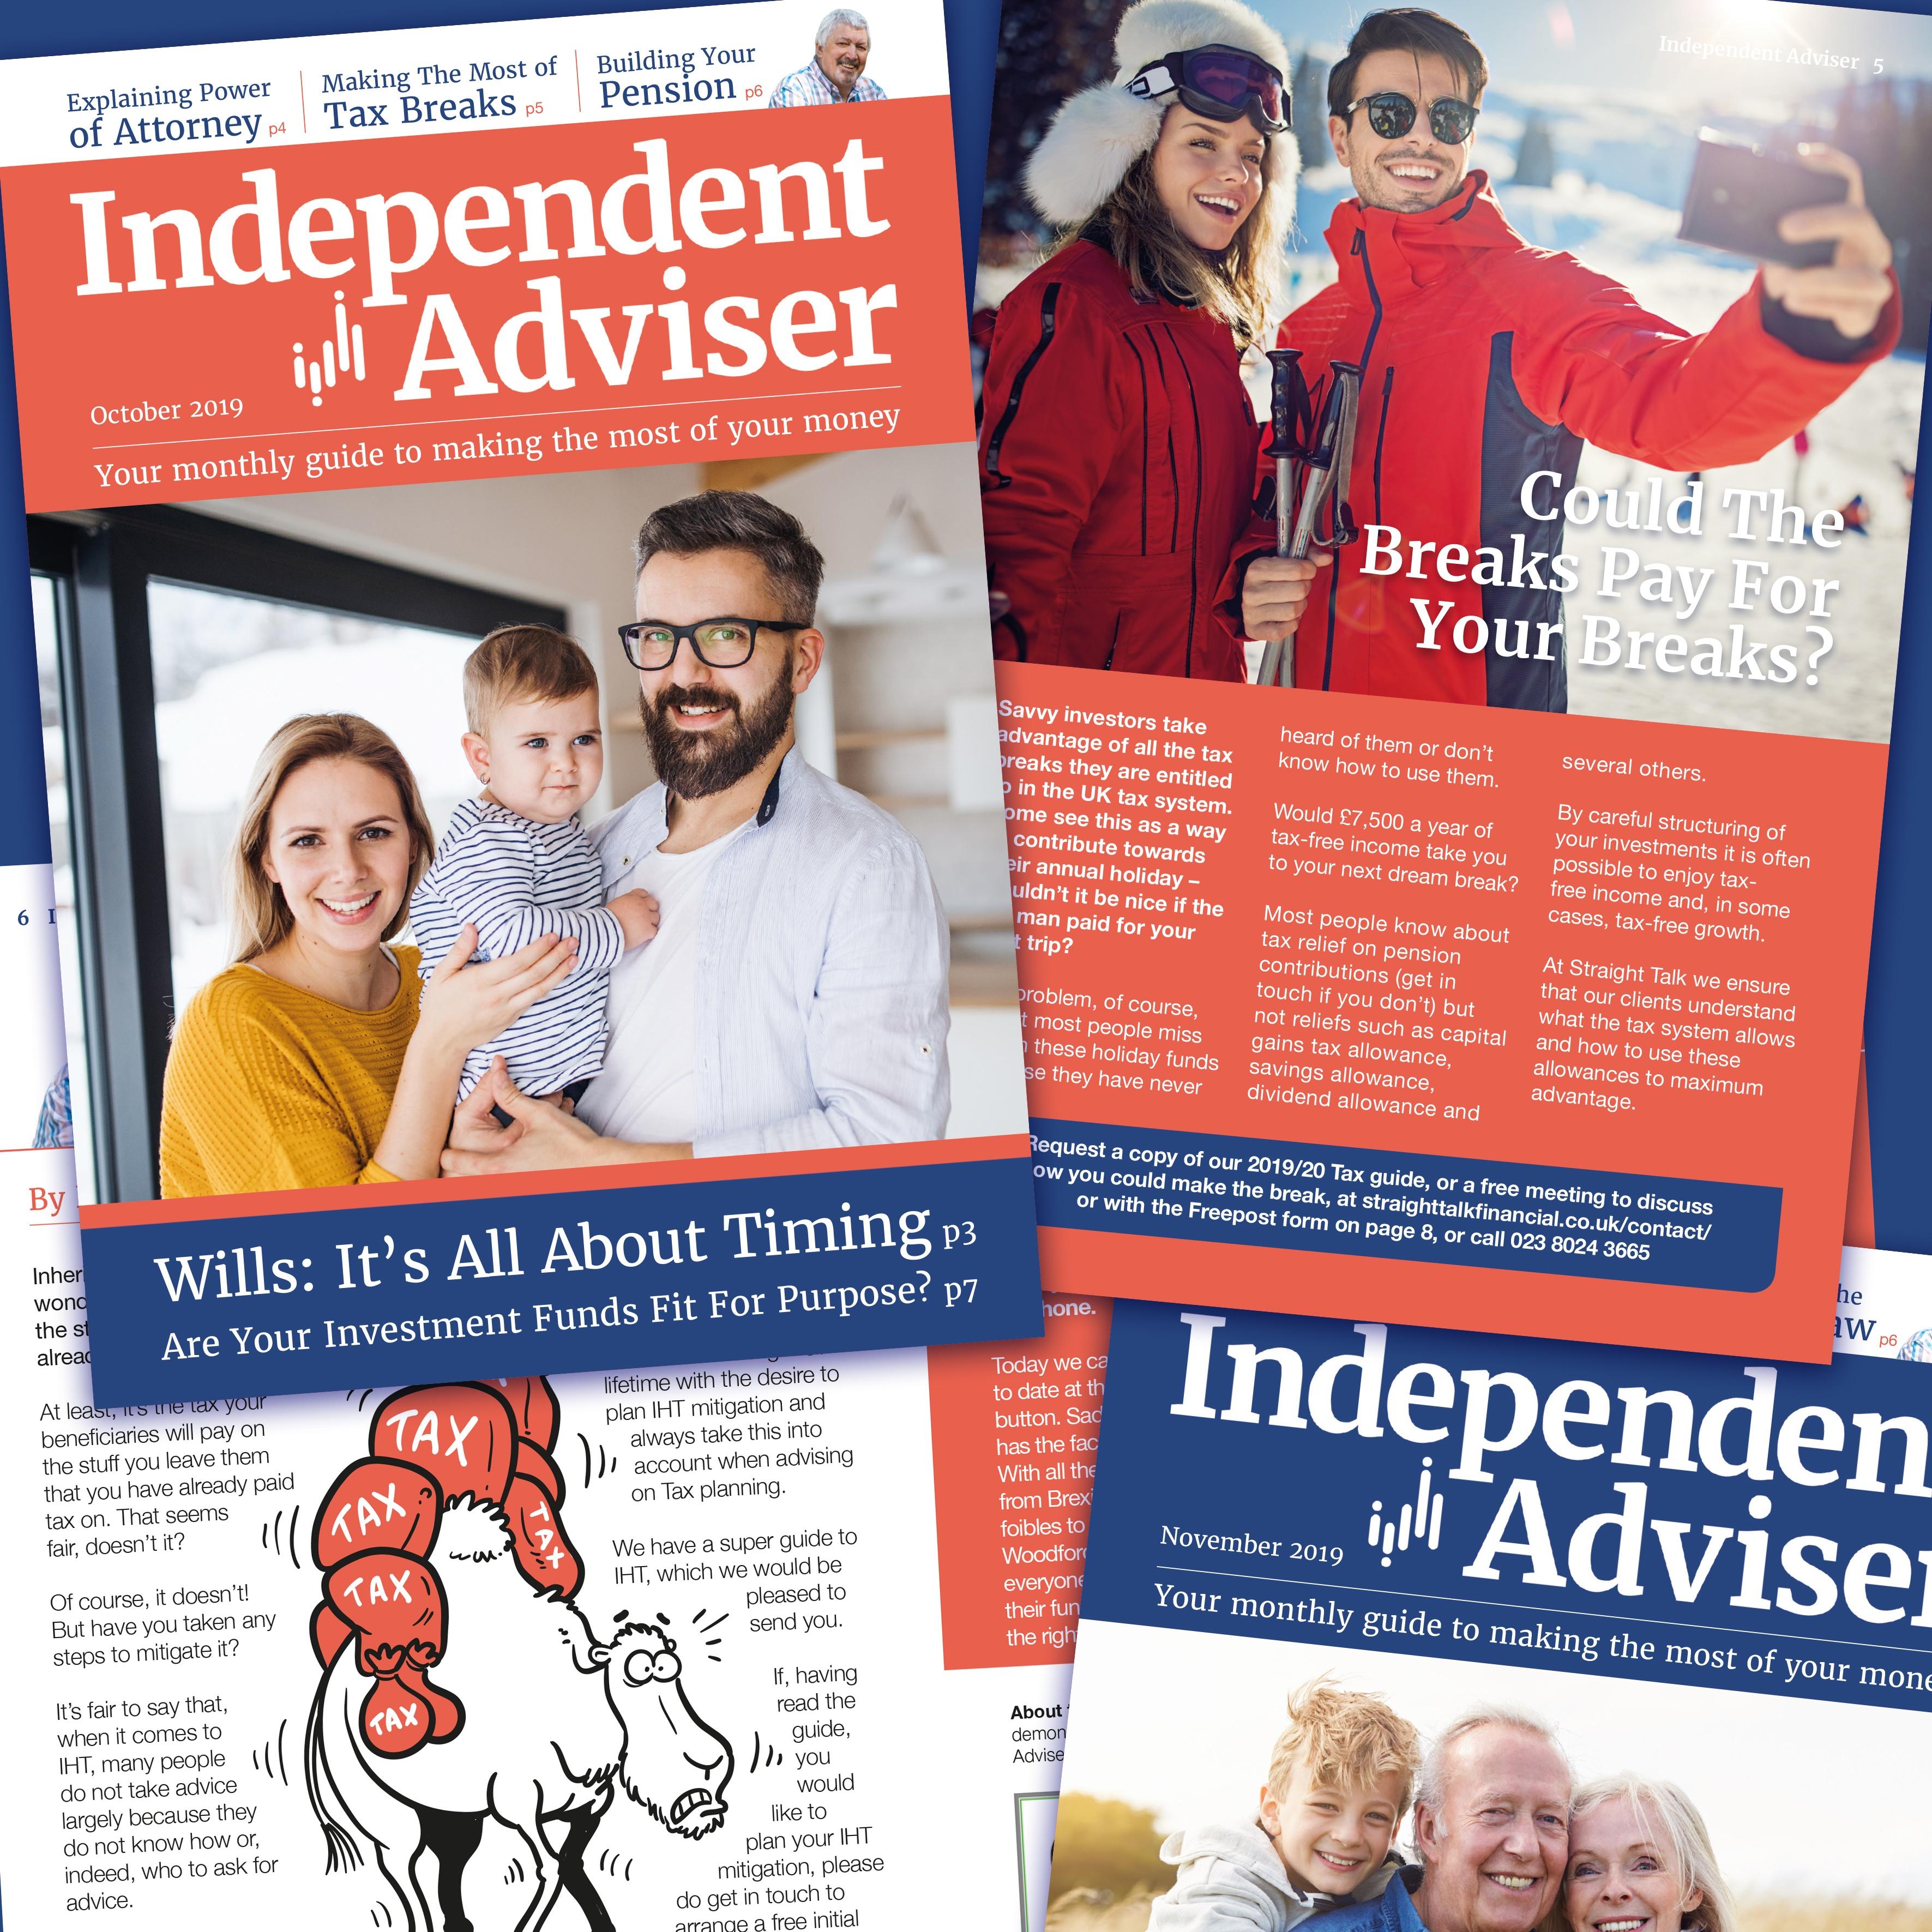 Independent Adviser magazine